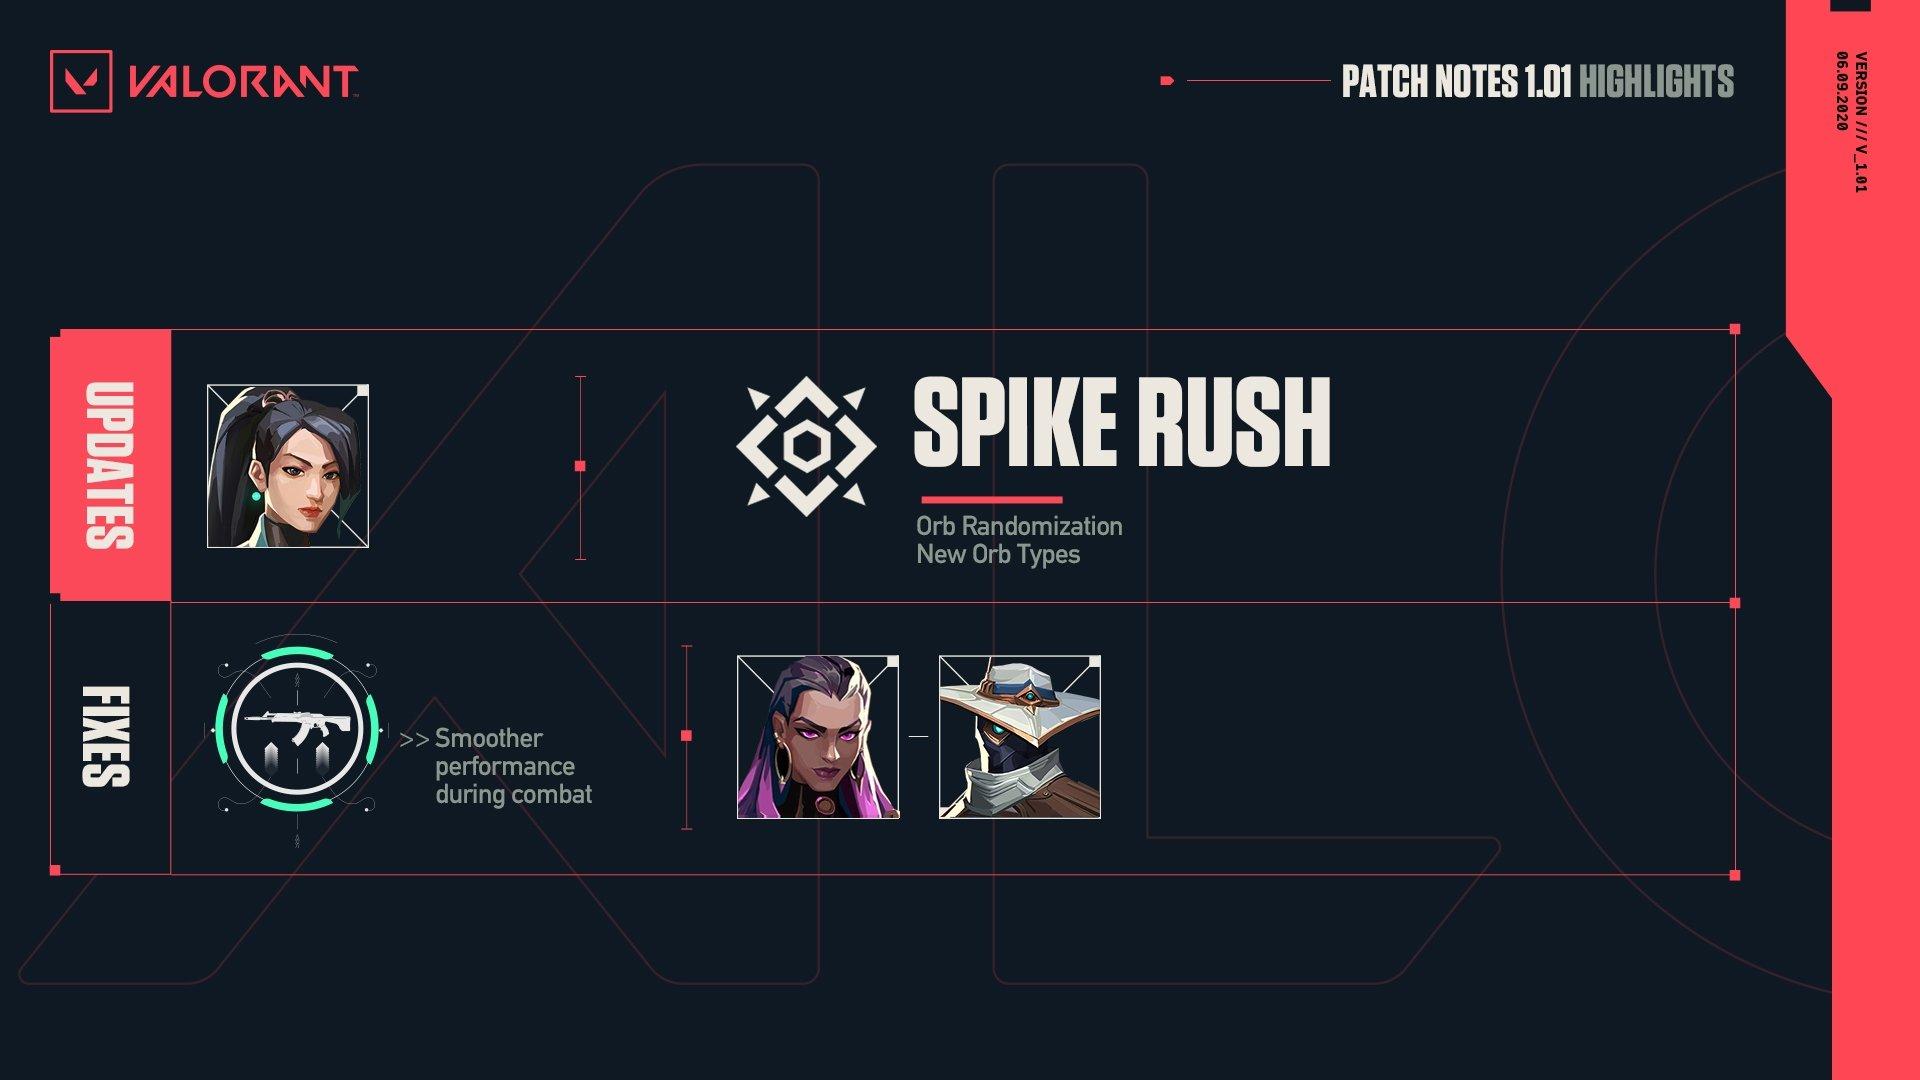 Sage Spike Rush